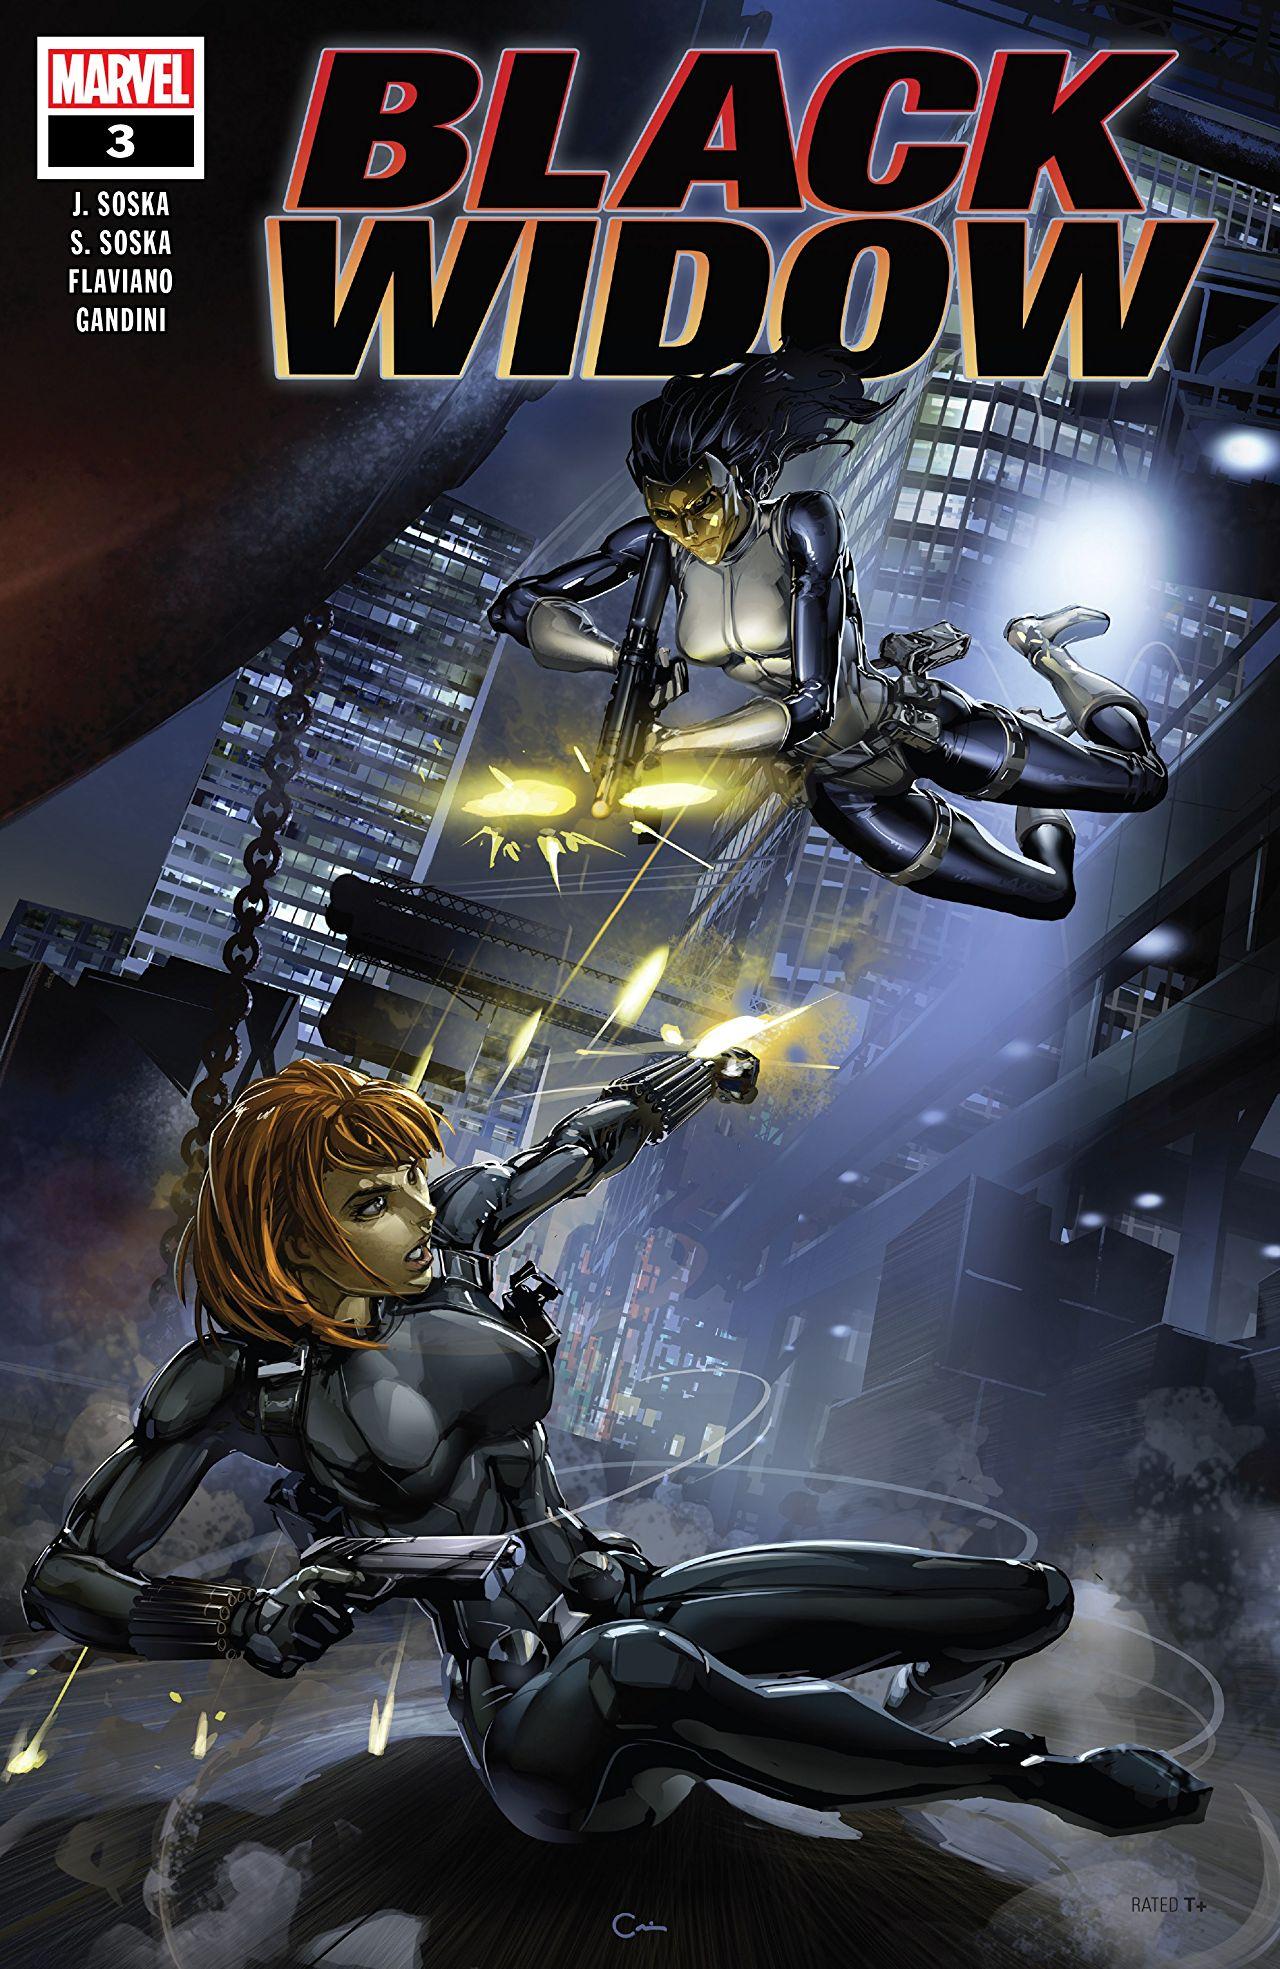 Black Widow #3 cover art by Clayton Crain